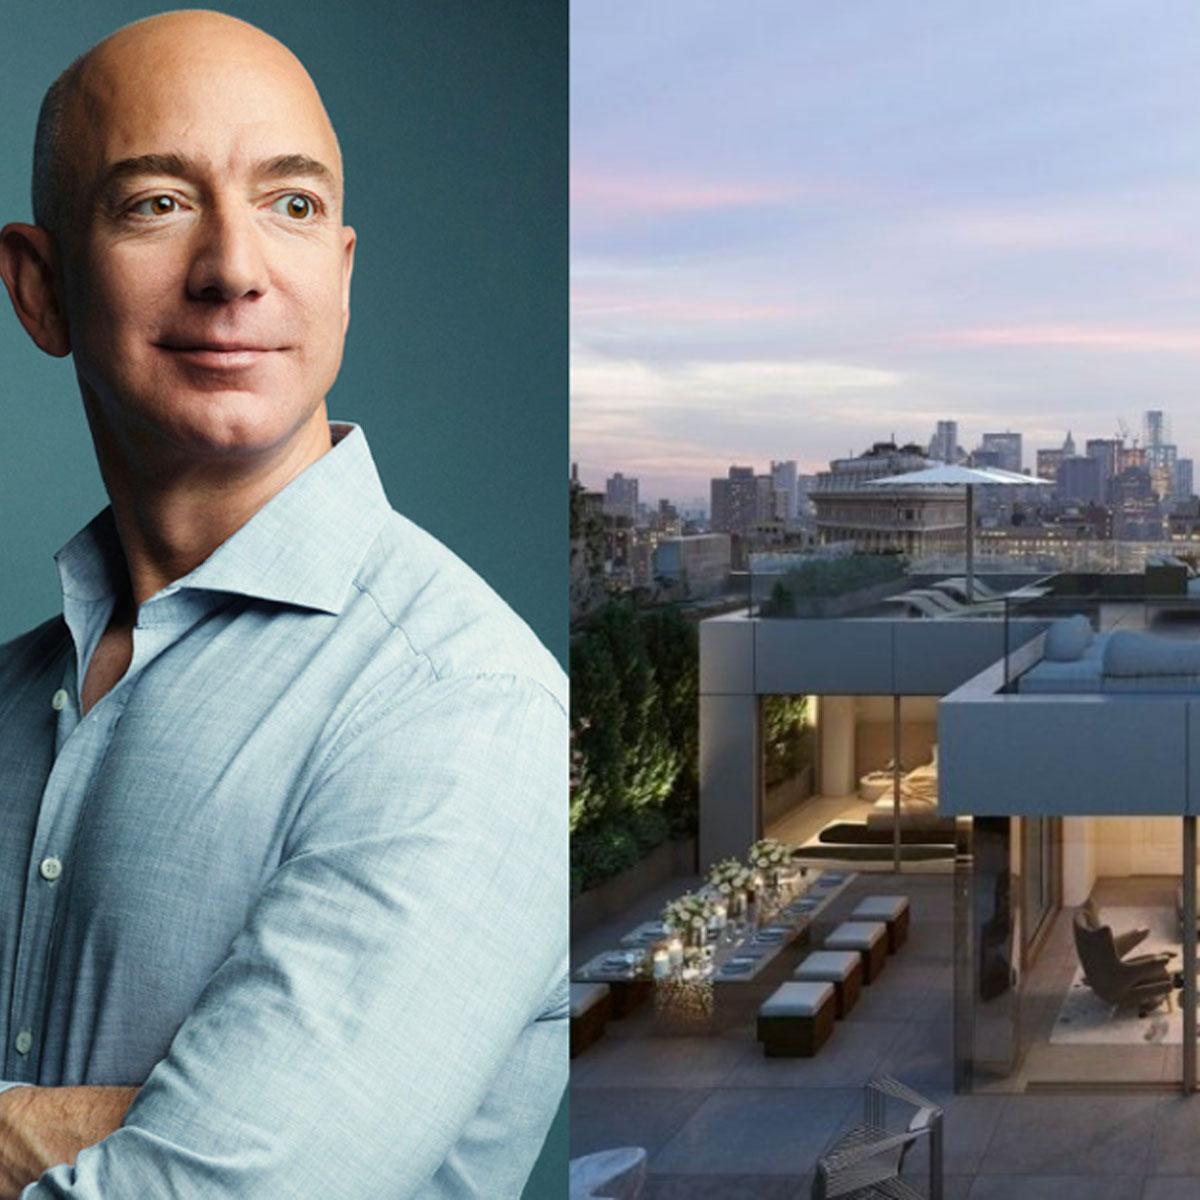 Jeff Bezos's $80M NoMad Condo Purchase Generating Buzz